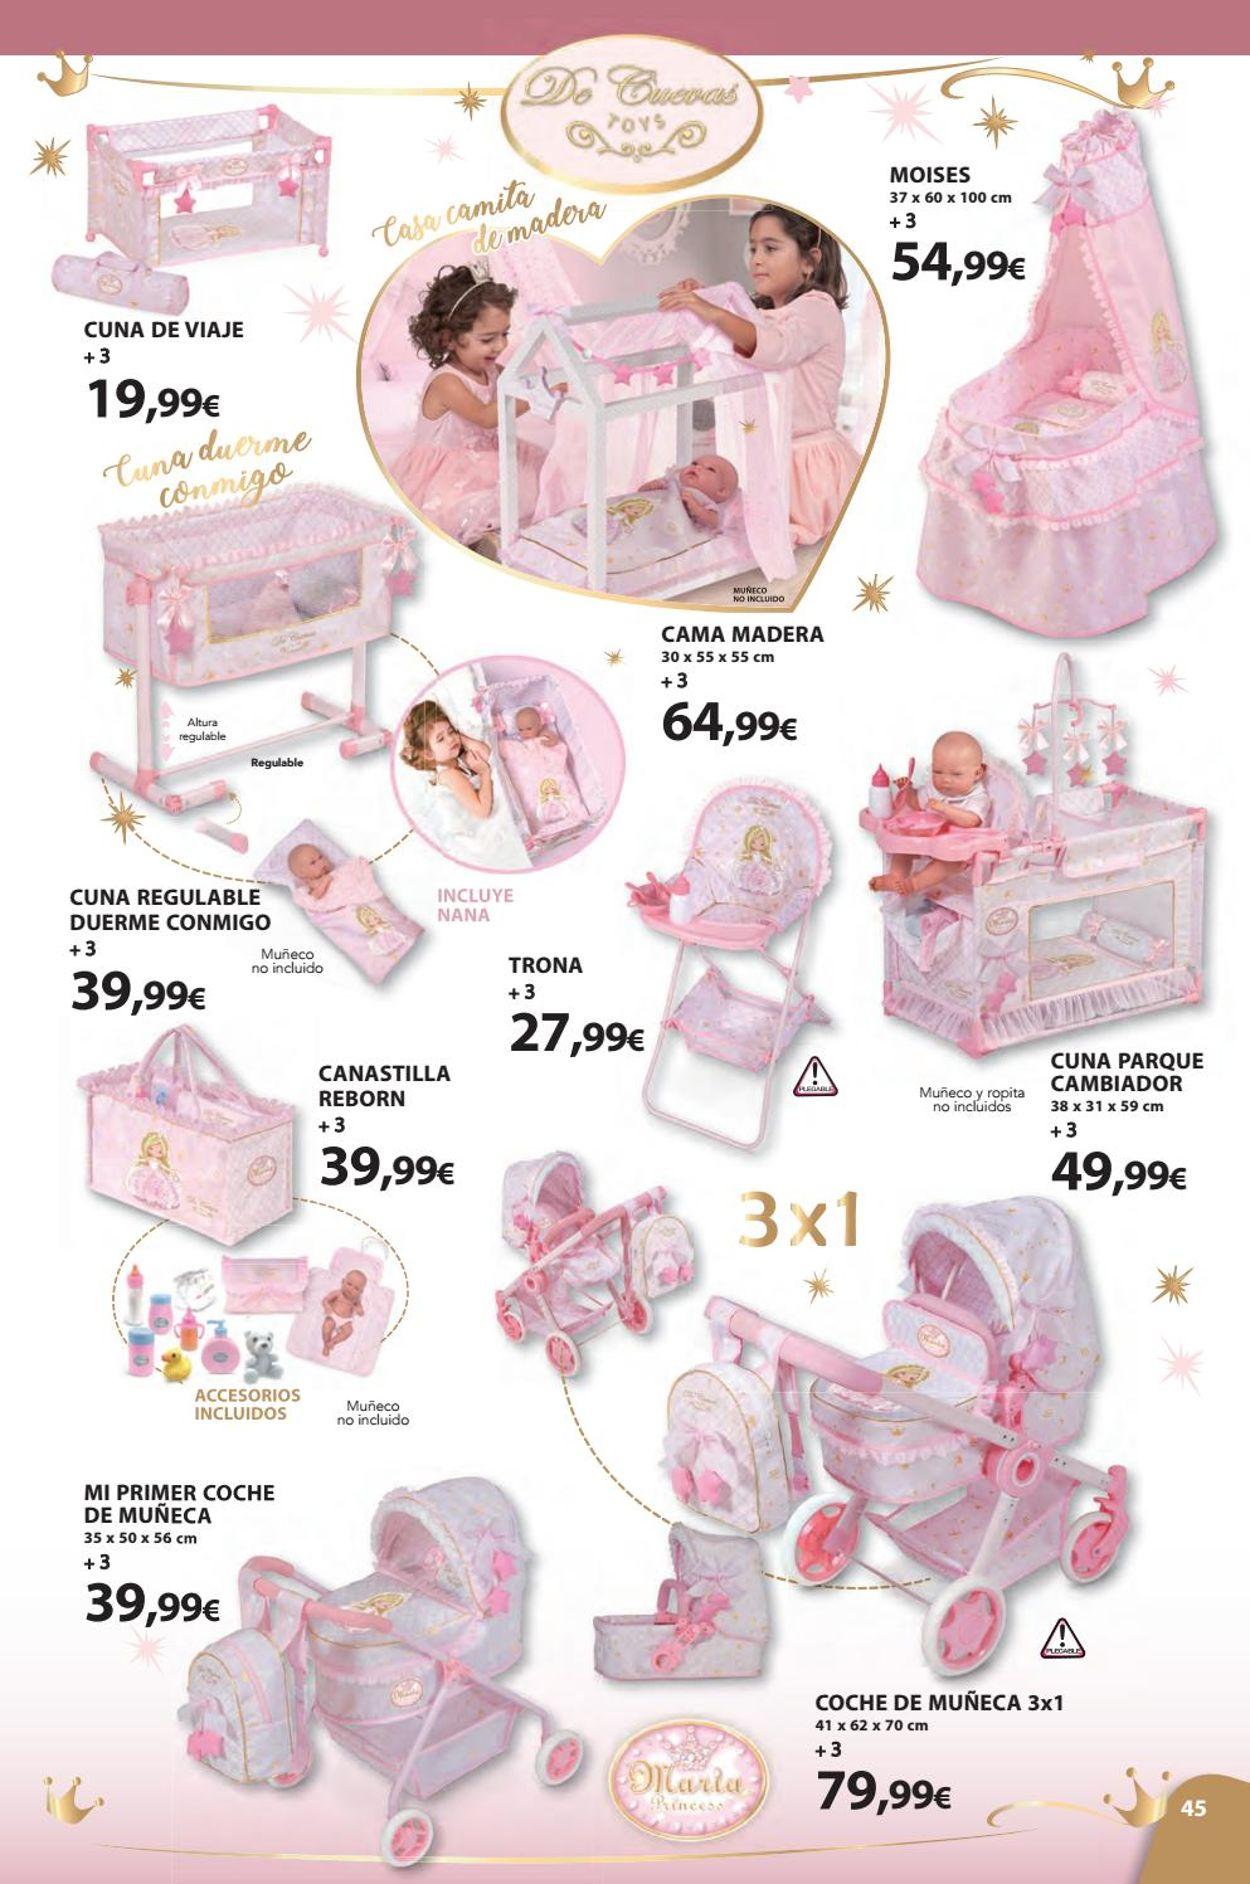 Toy Planet Folleto - 08.11-24.12.2019 (Página 45)